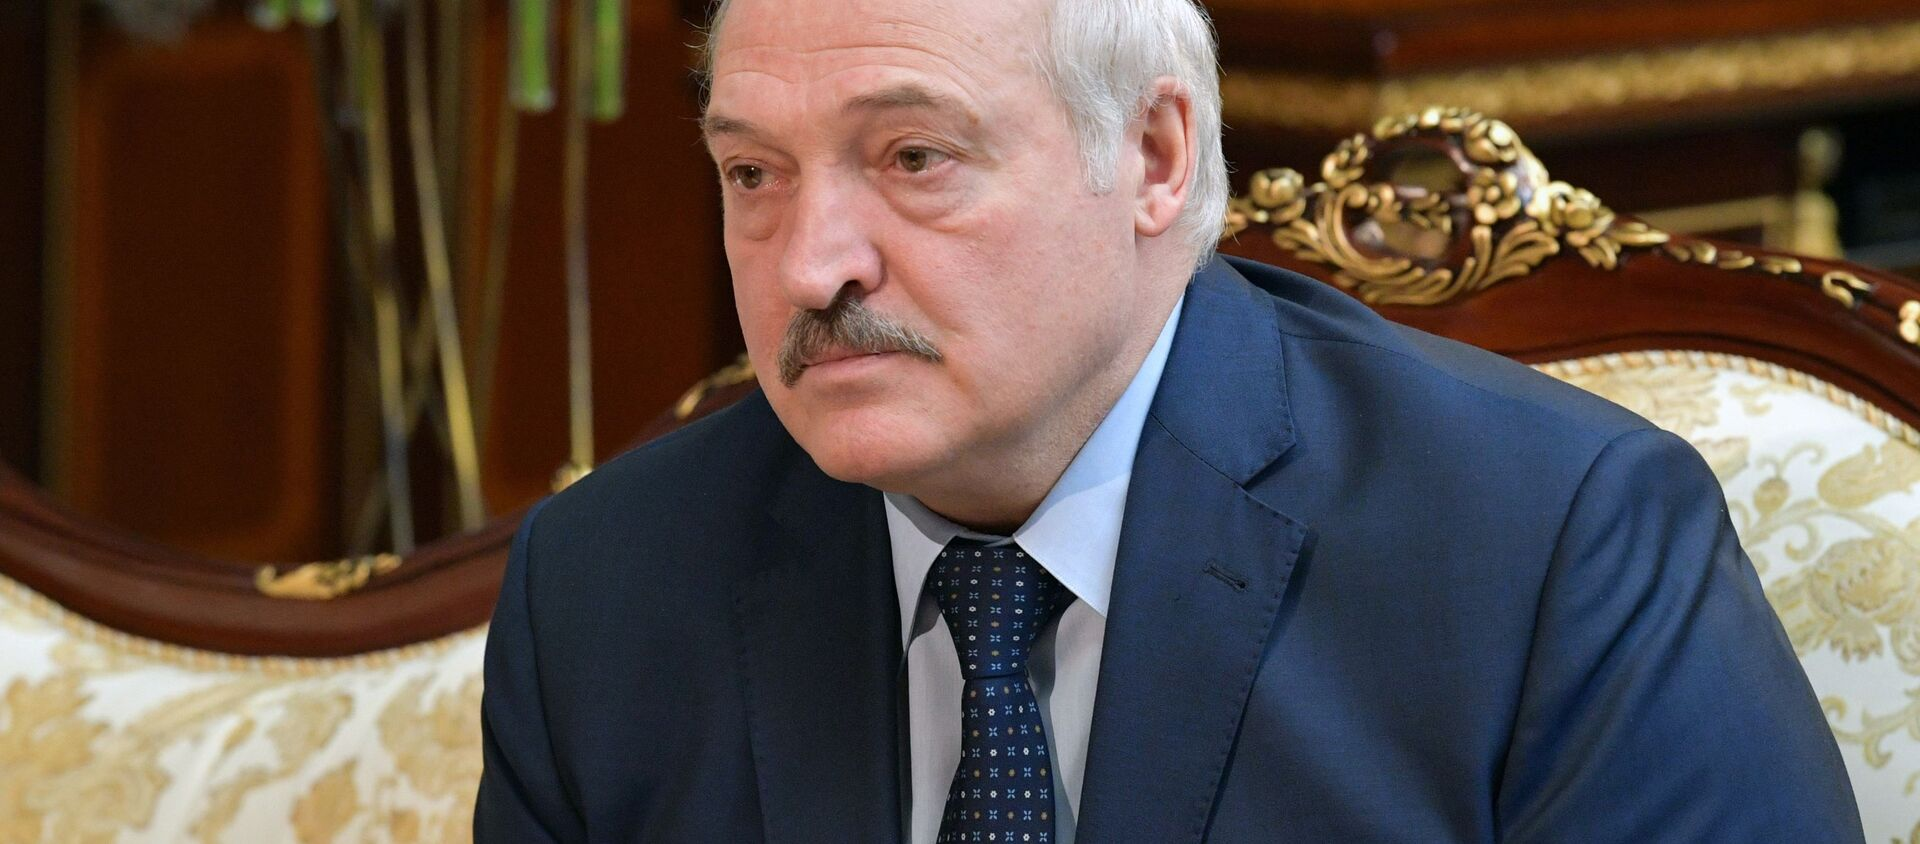 Tổng thống Belarus Alexander Lukashenko. - Sputnik Việt Nam, 1920, 26.05.2021